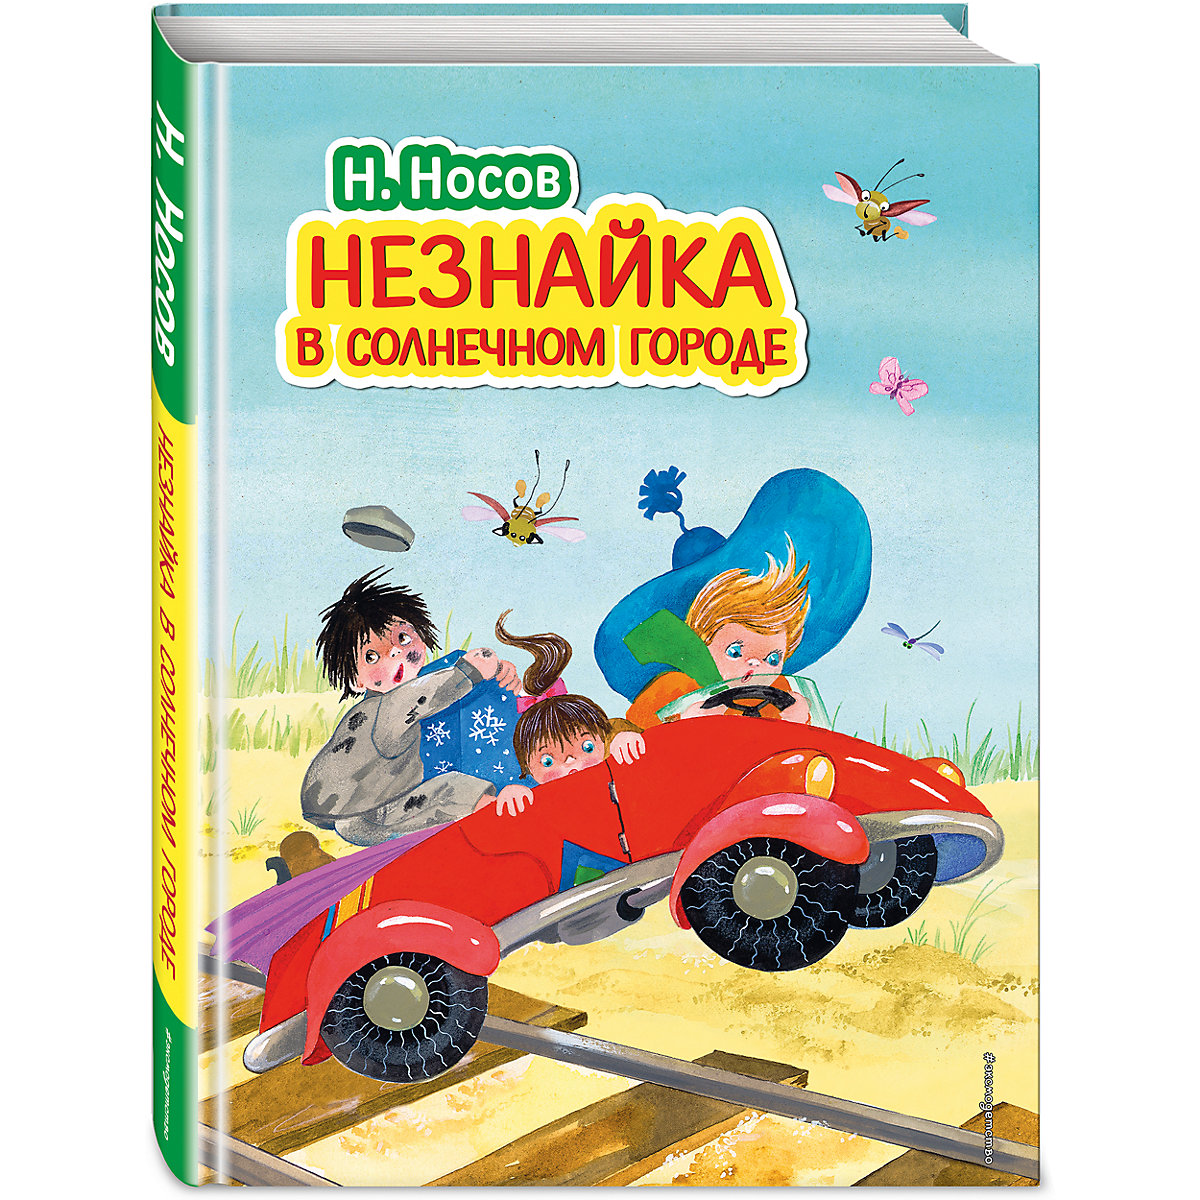 Books EKSMO 5535560 Children Education Encyclopedia Alphabet Dictionary Book For Baby MTpromo